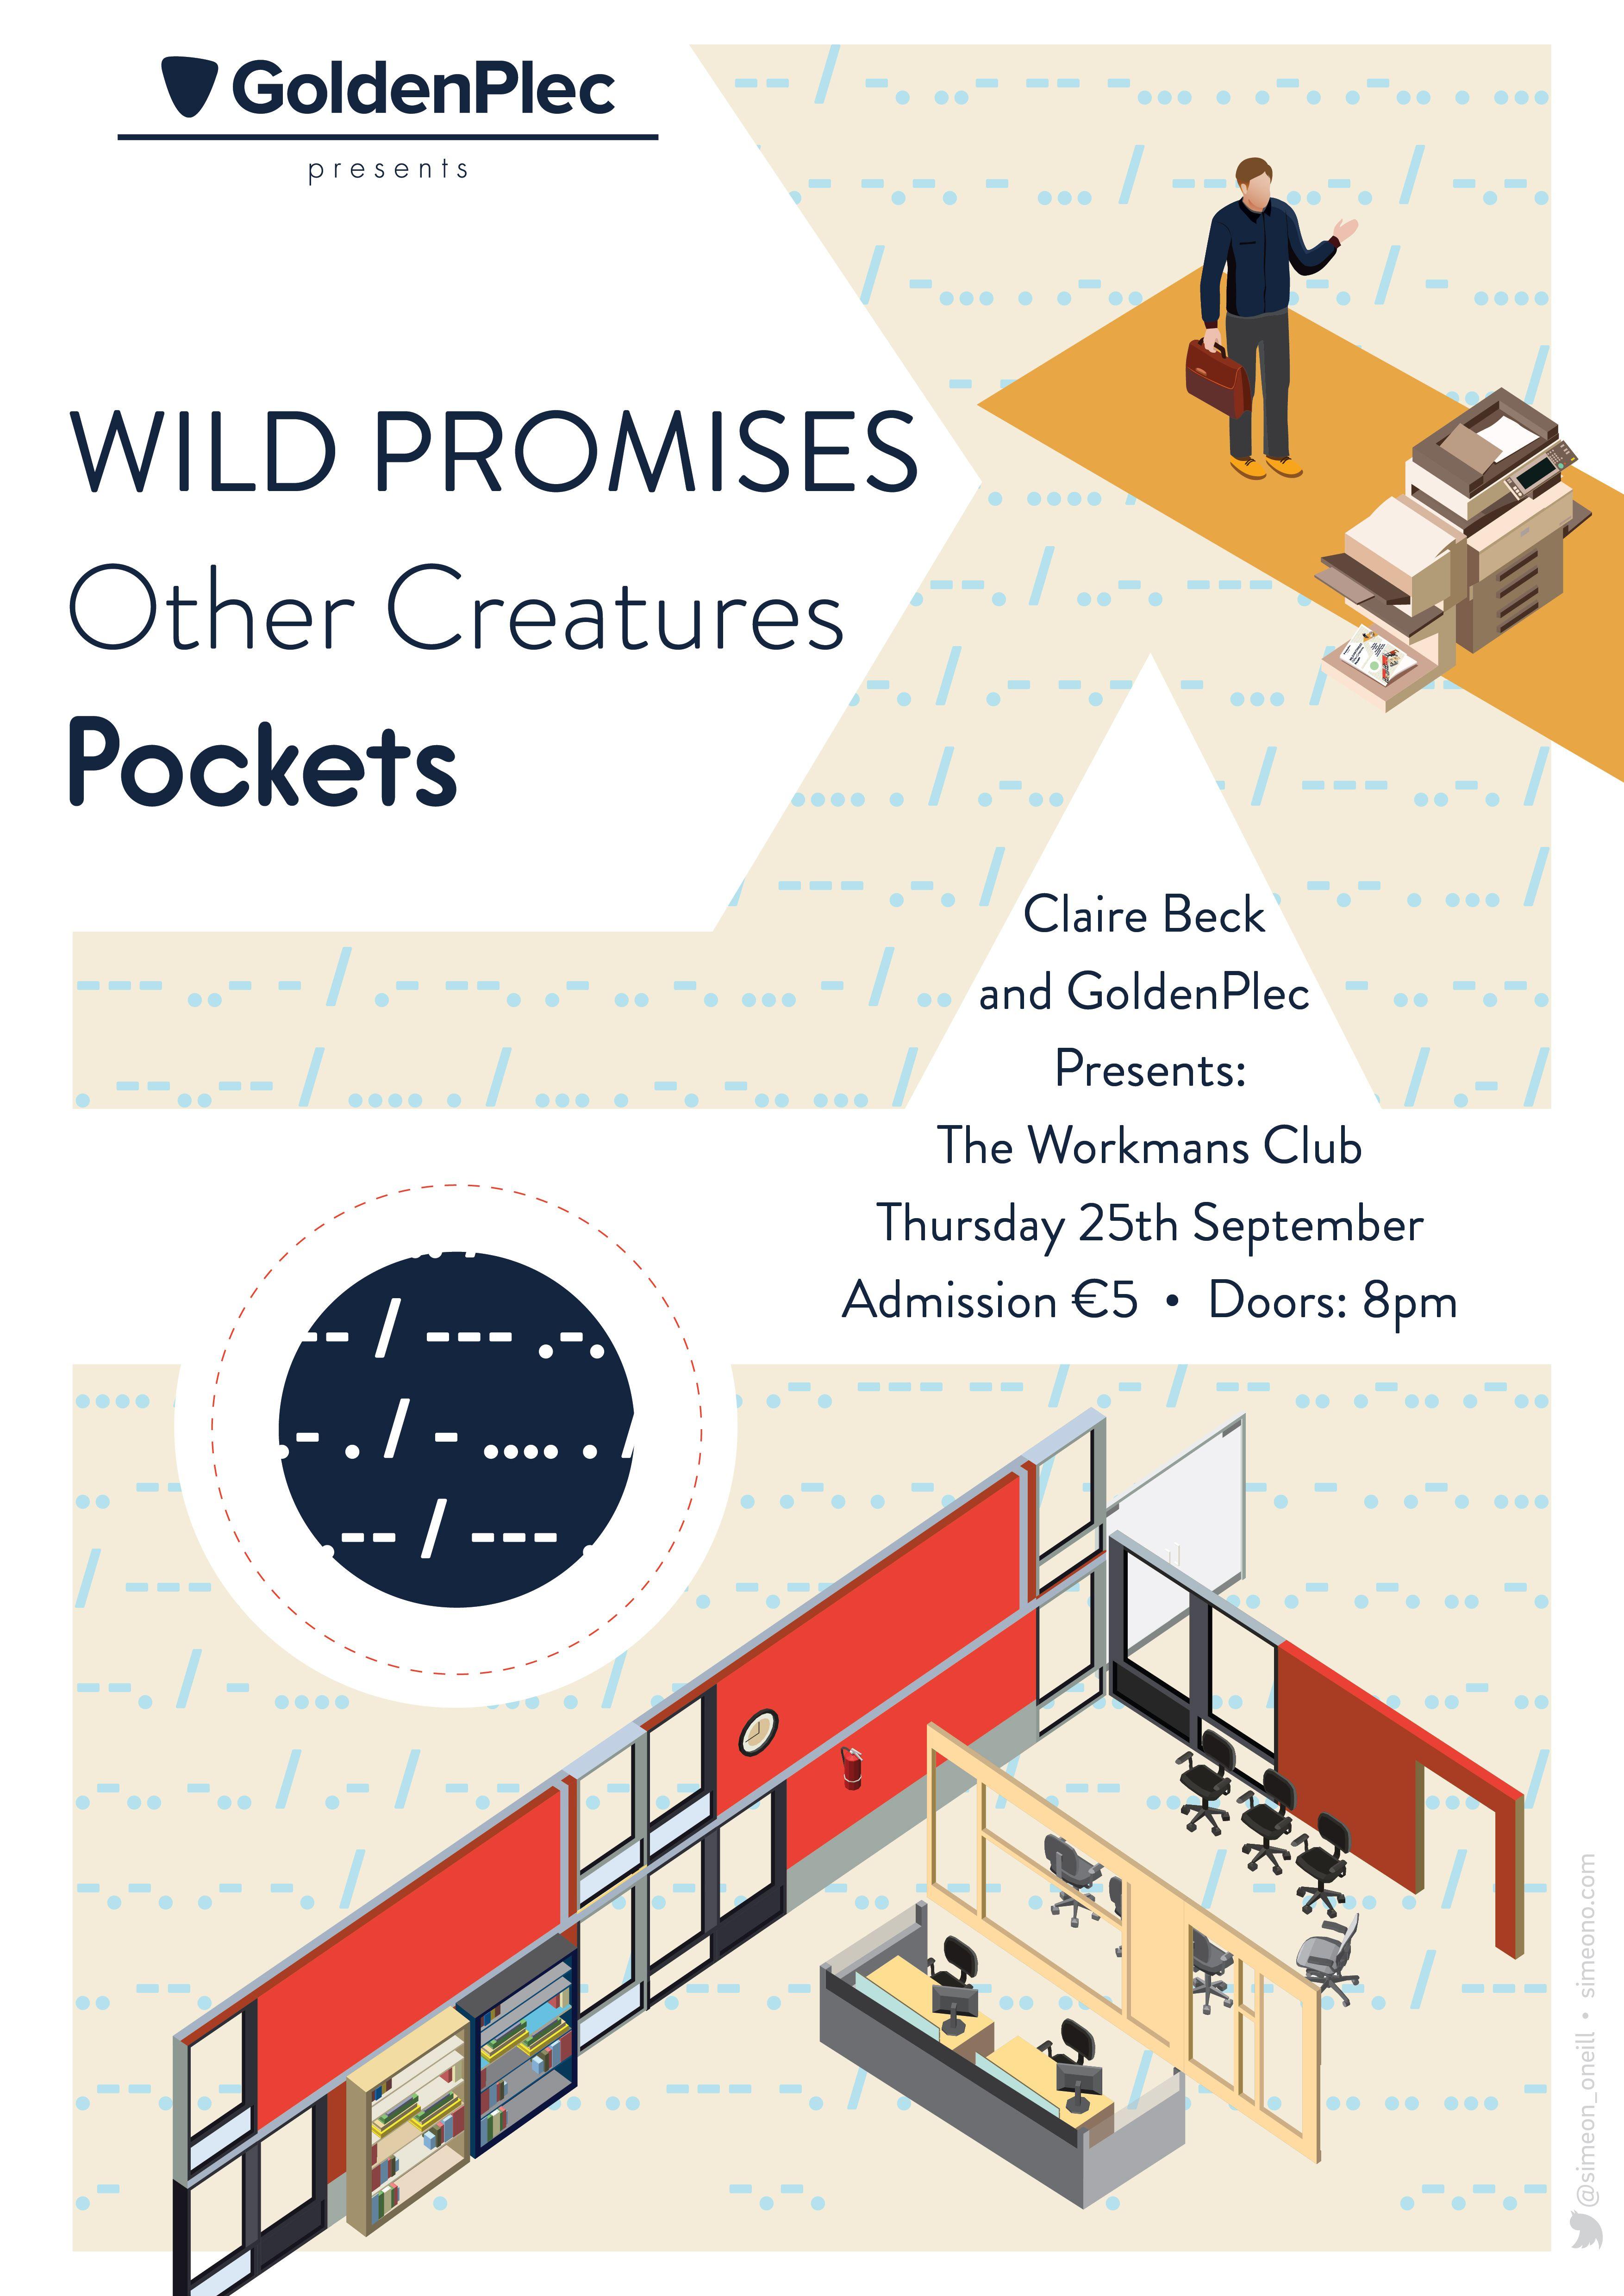 #GoldenBeck - September  - Wild Promises, Other Creatures, Pockets